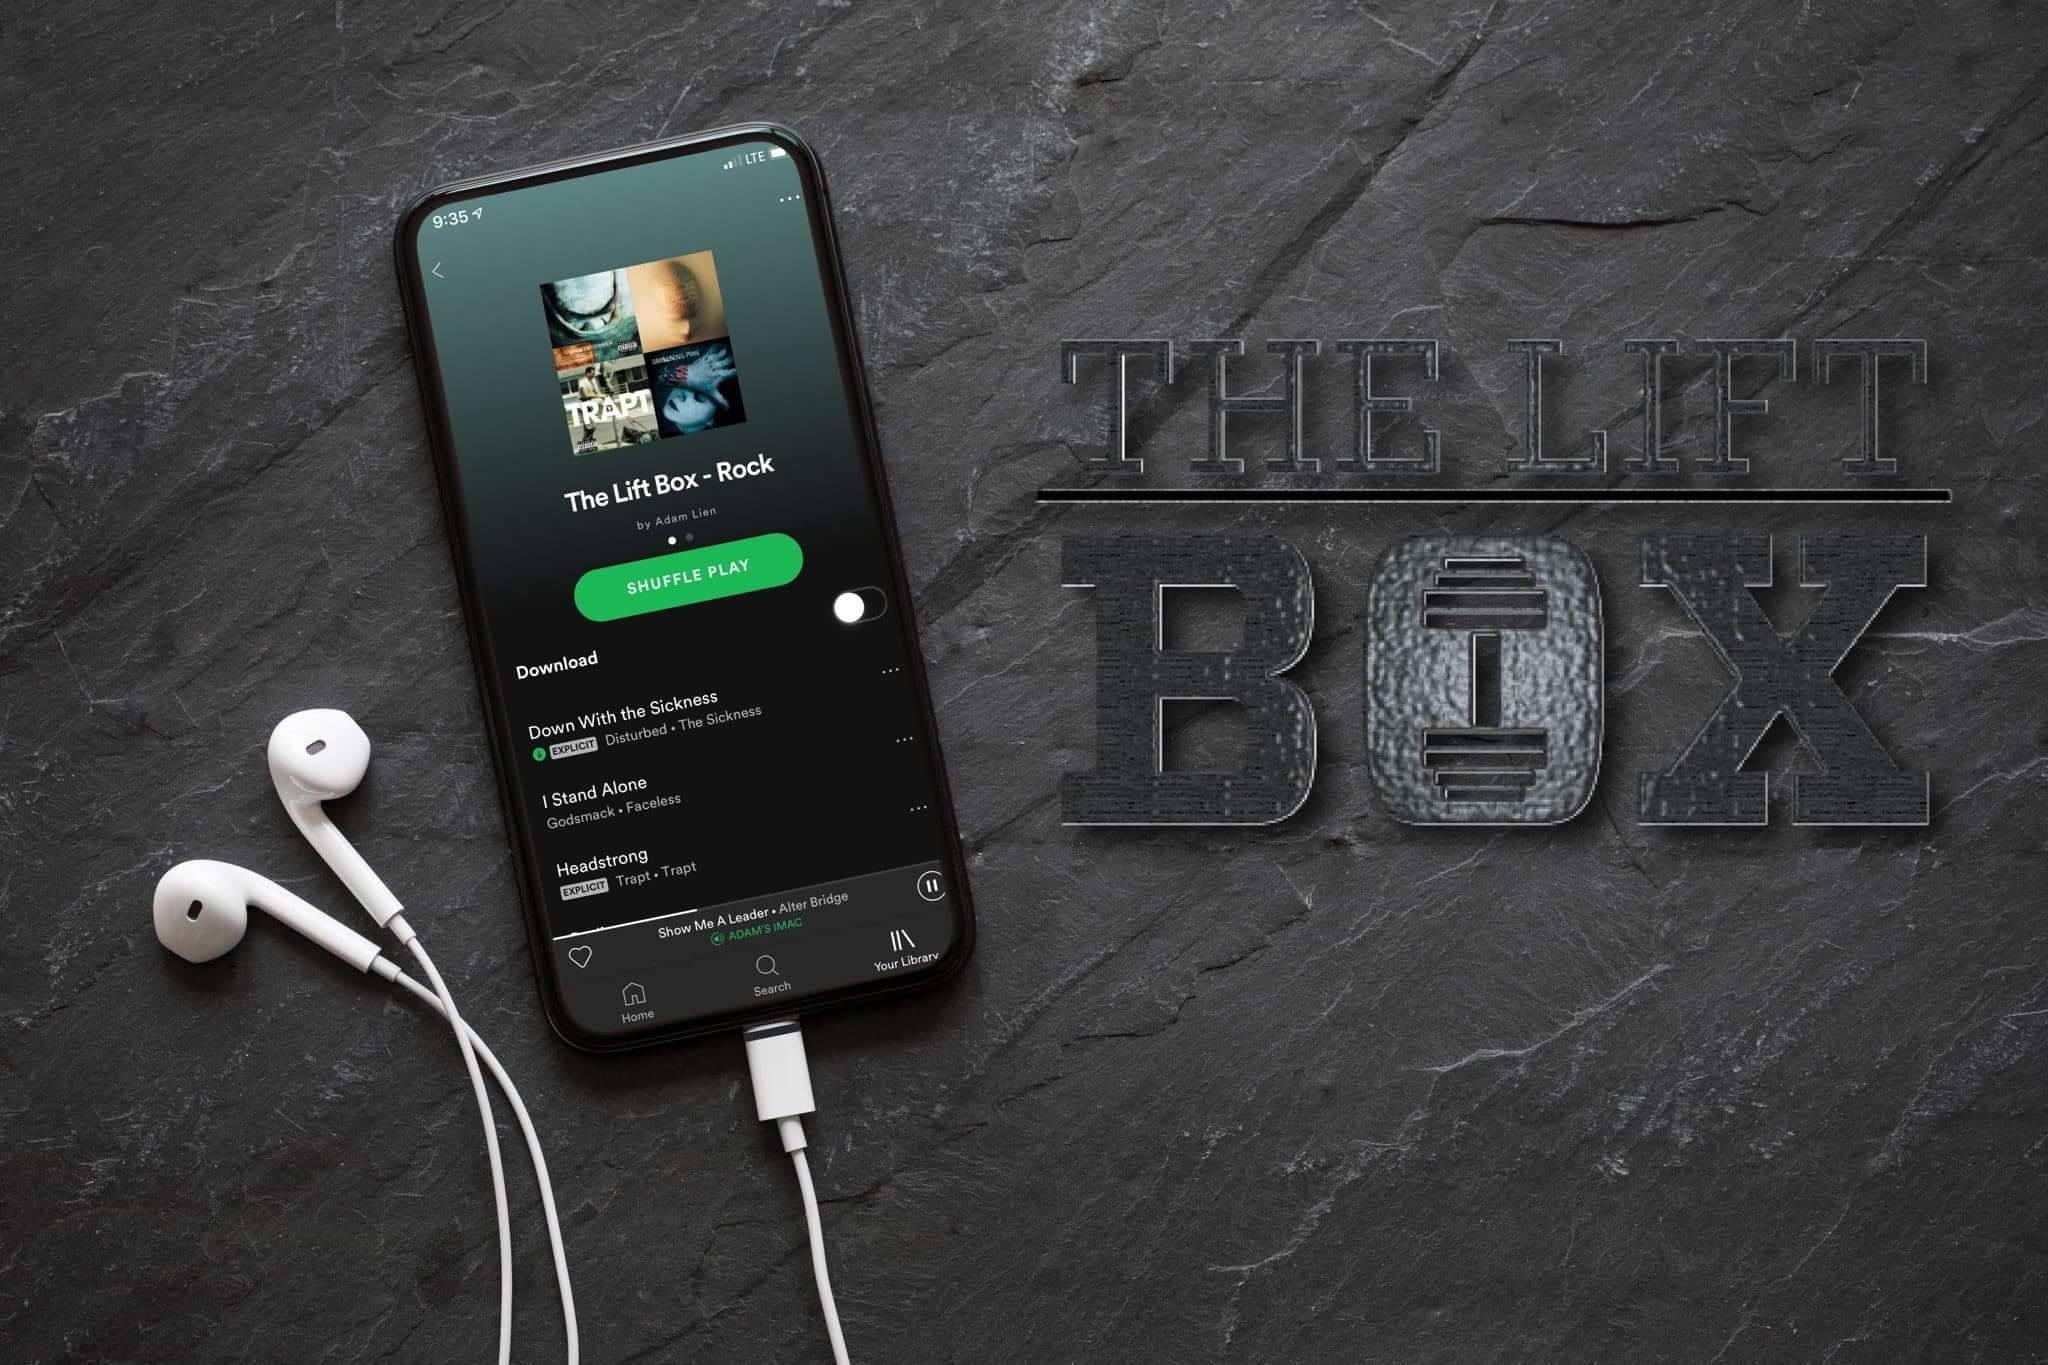 Spotify Playlist by The Lift Box